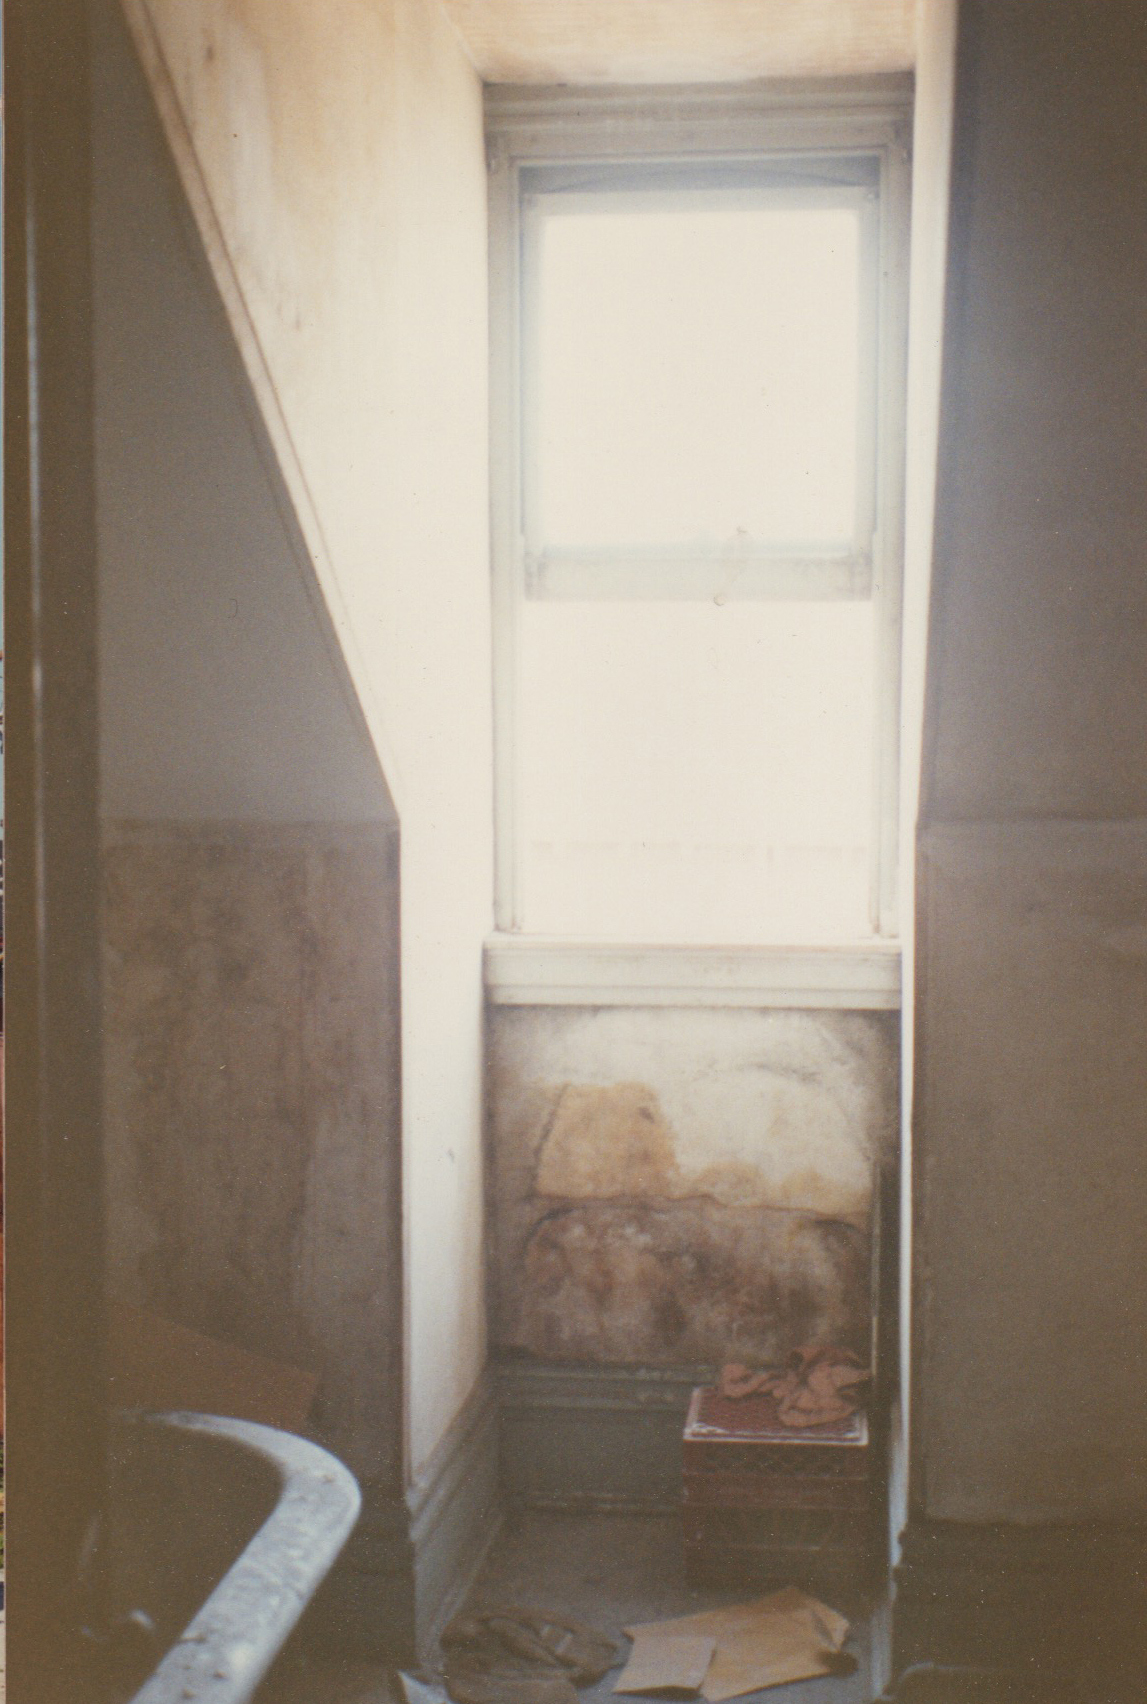 lp bath window